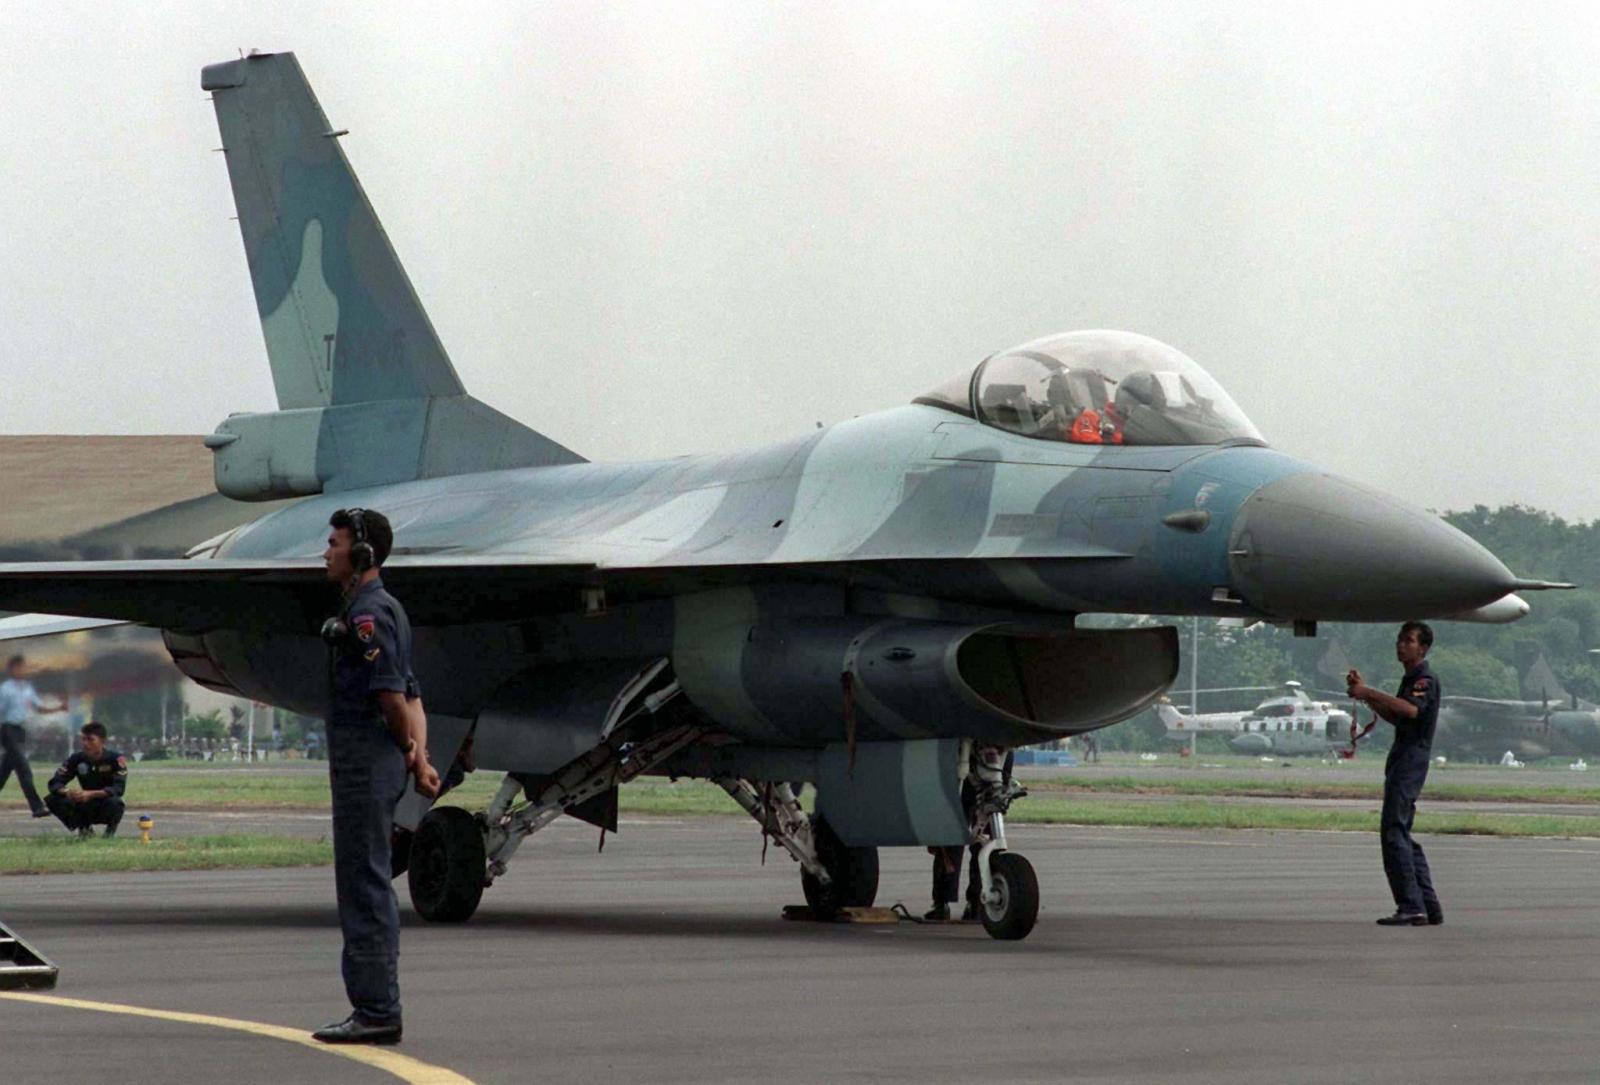 Indonesia Scrambles Fighter Jets To Intercept Malaysian